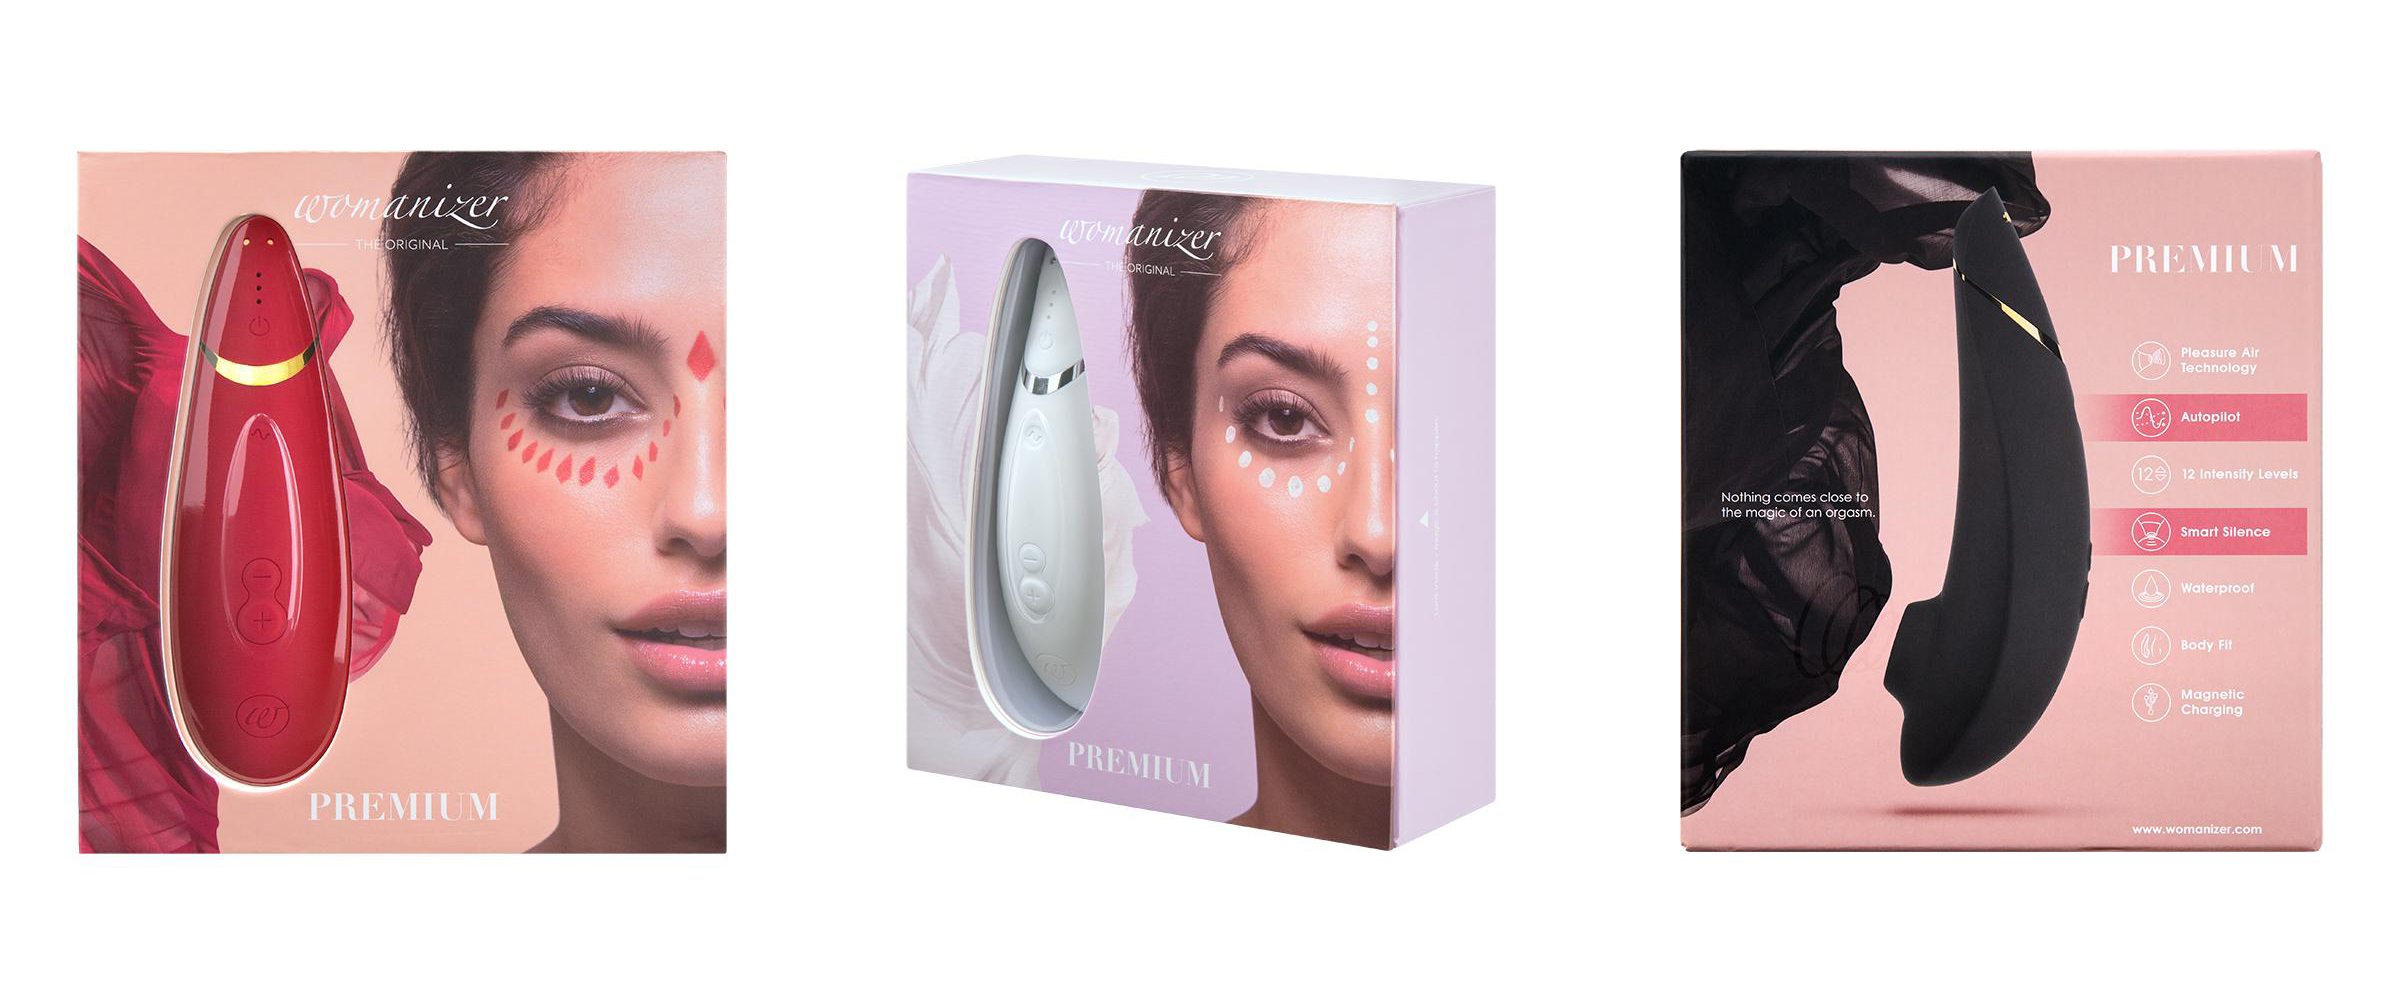 Womanizer Premium Vibrator with Pleasure Air Technology | Lexi Sylver